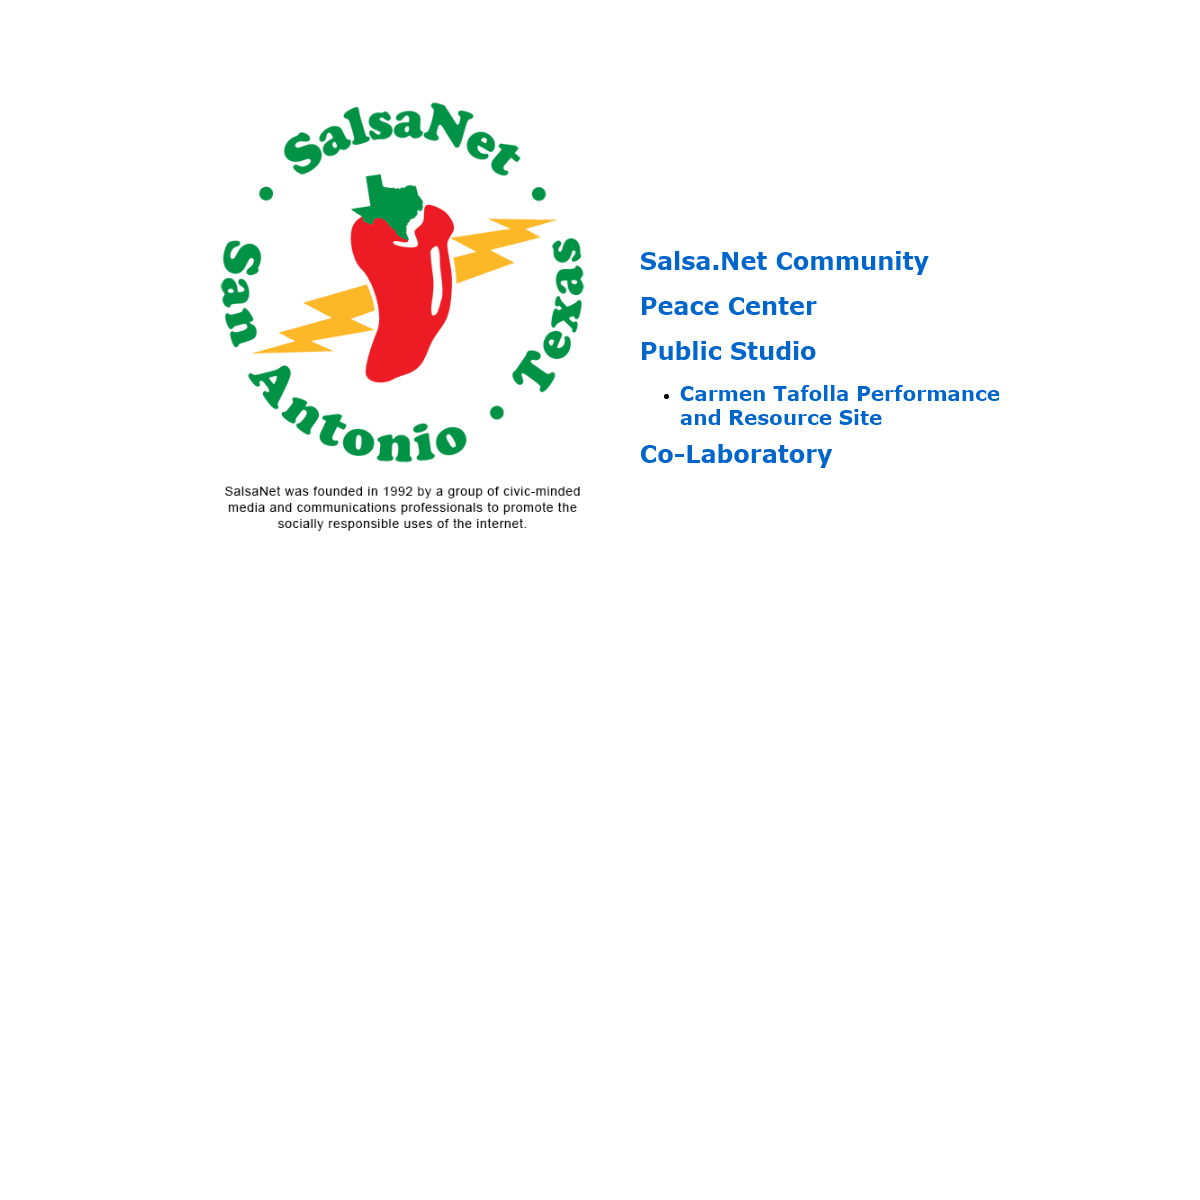 A complete backup of salsa.net